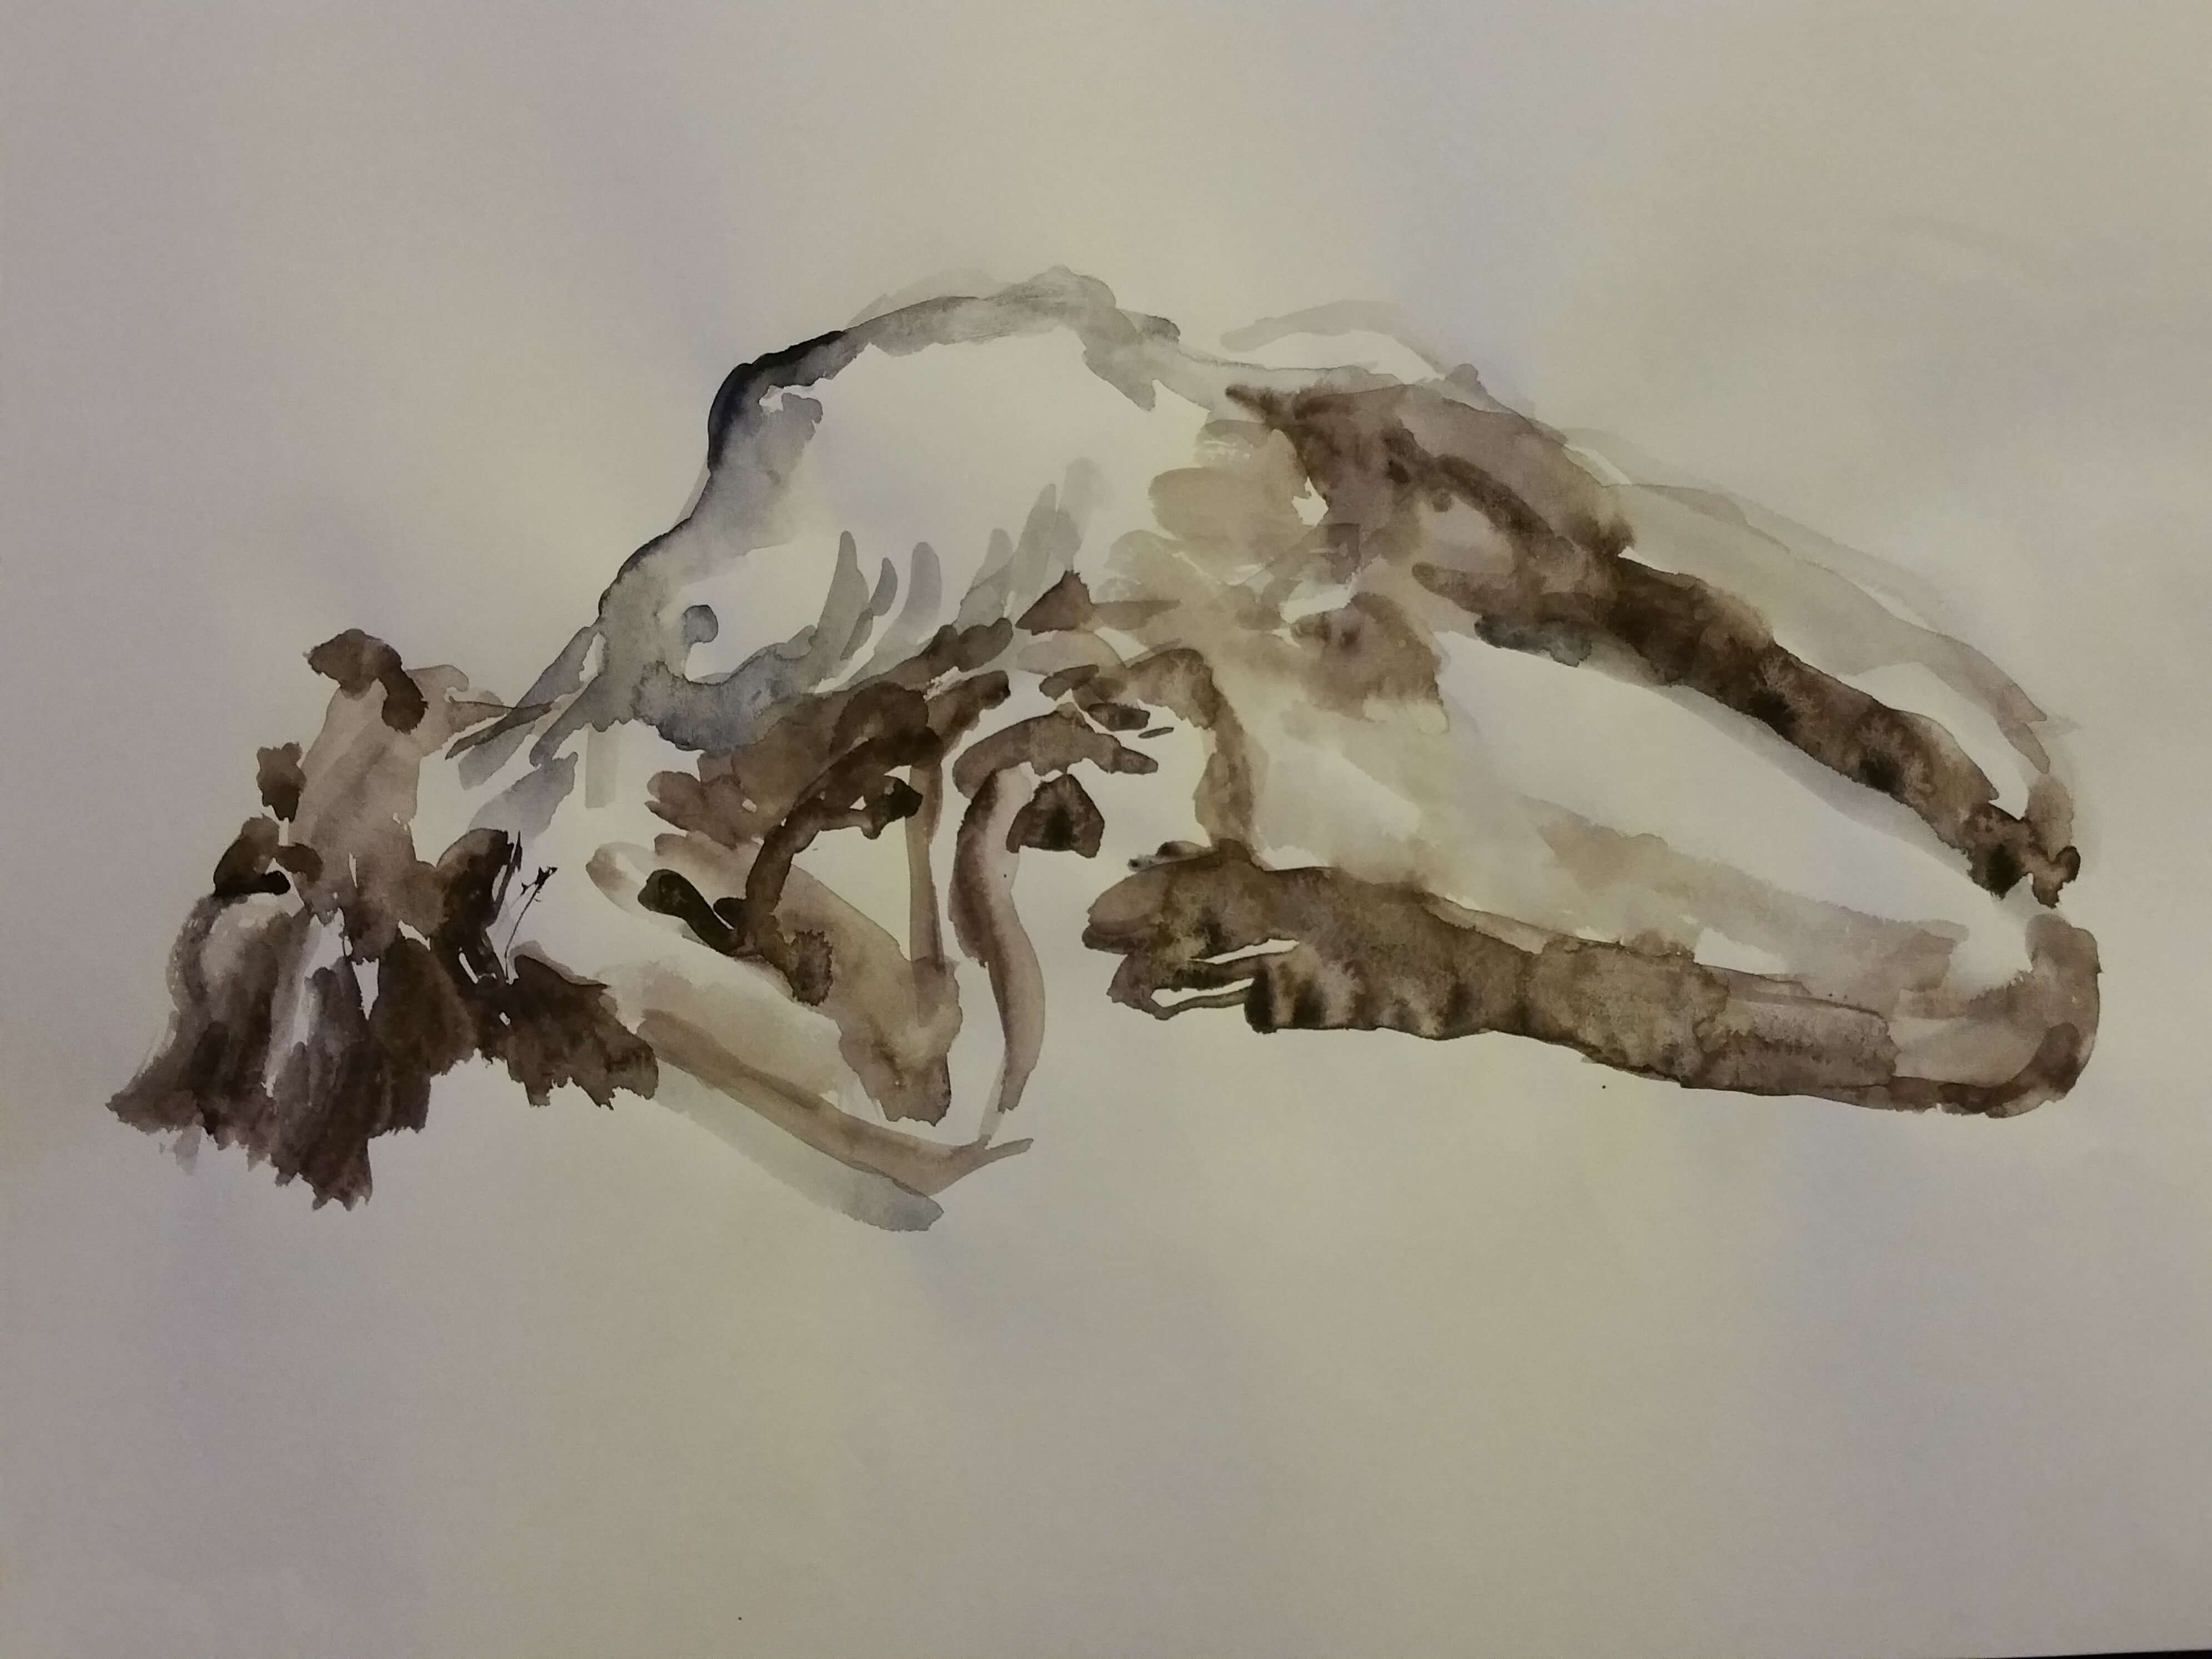 Poses arqu�es aquarelles monochromes  cours de dessin